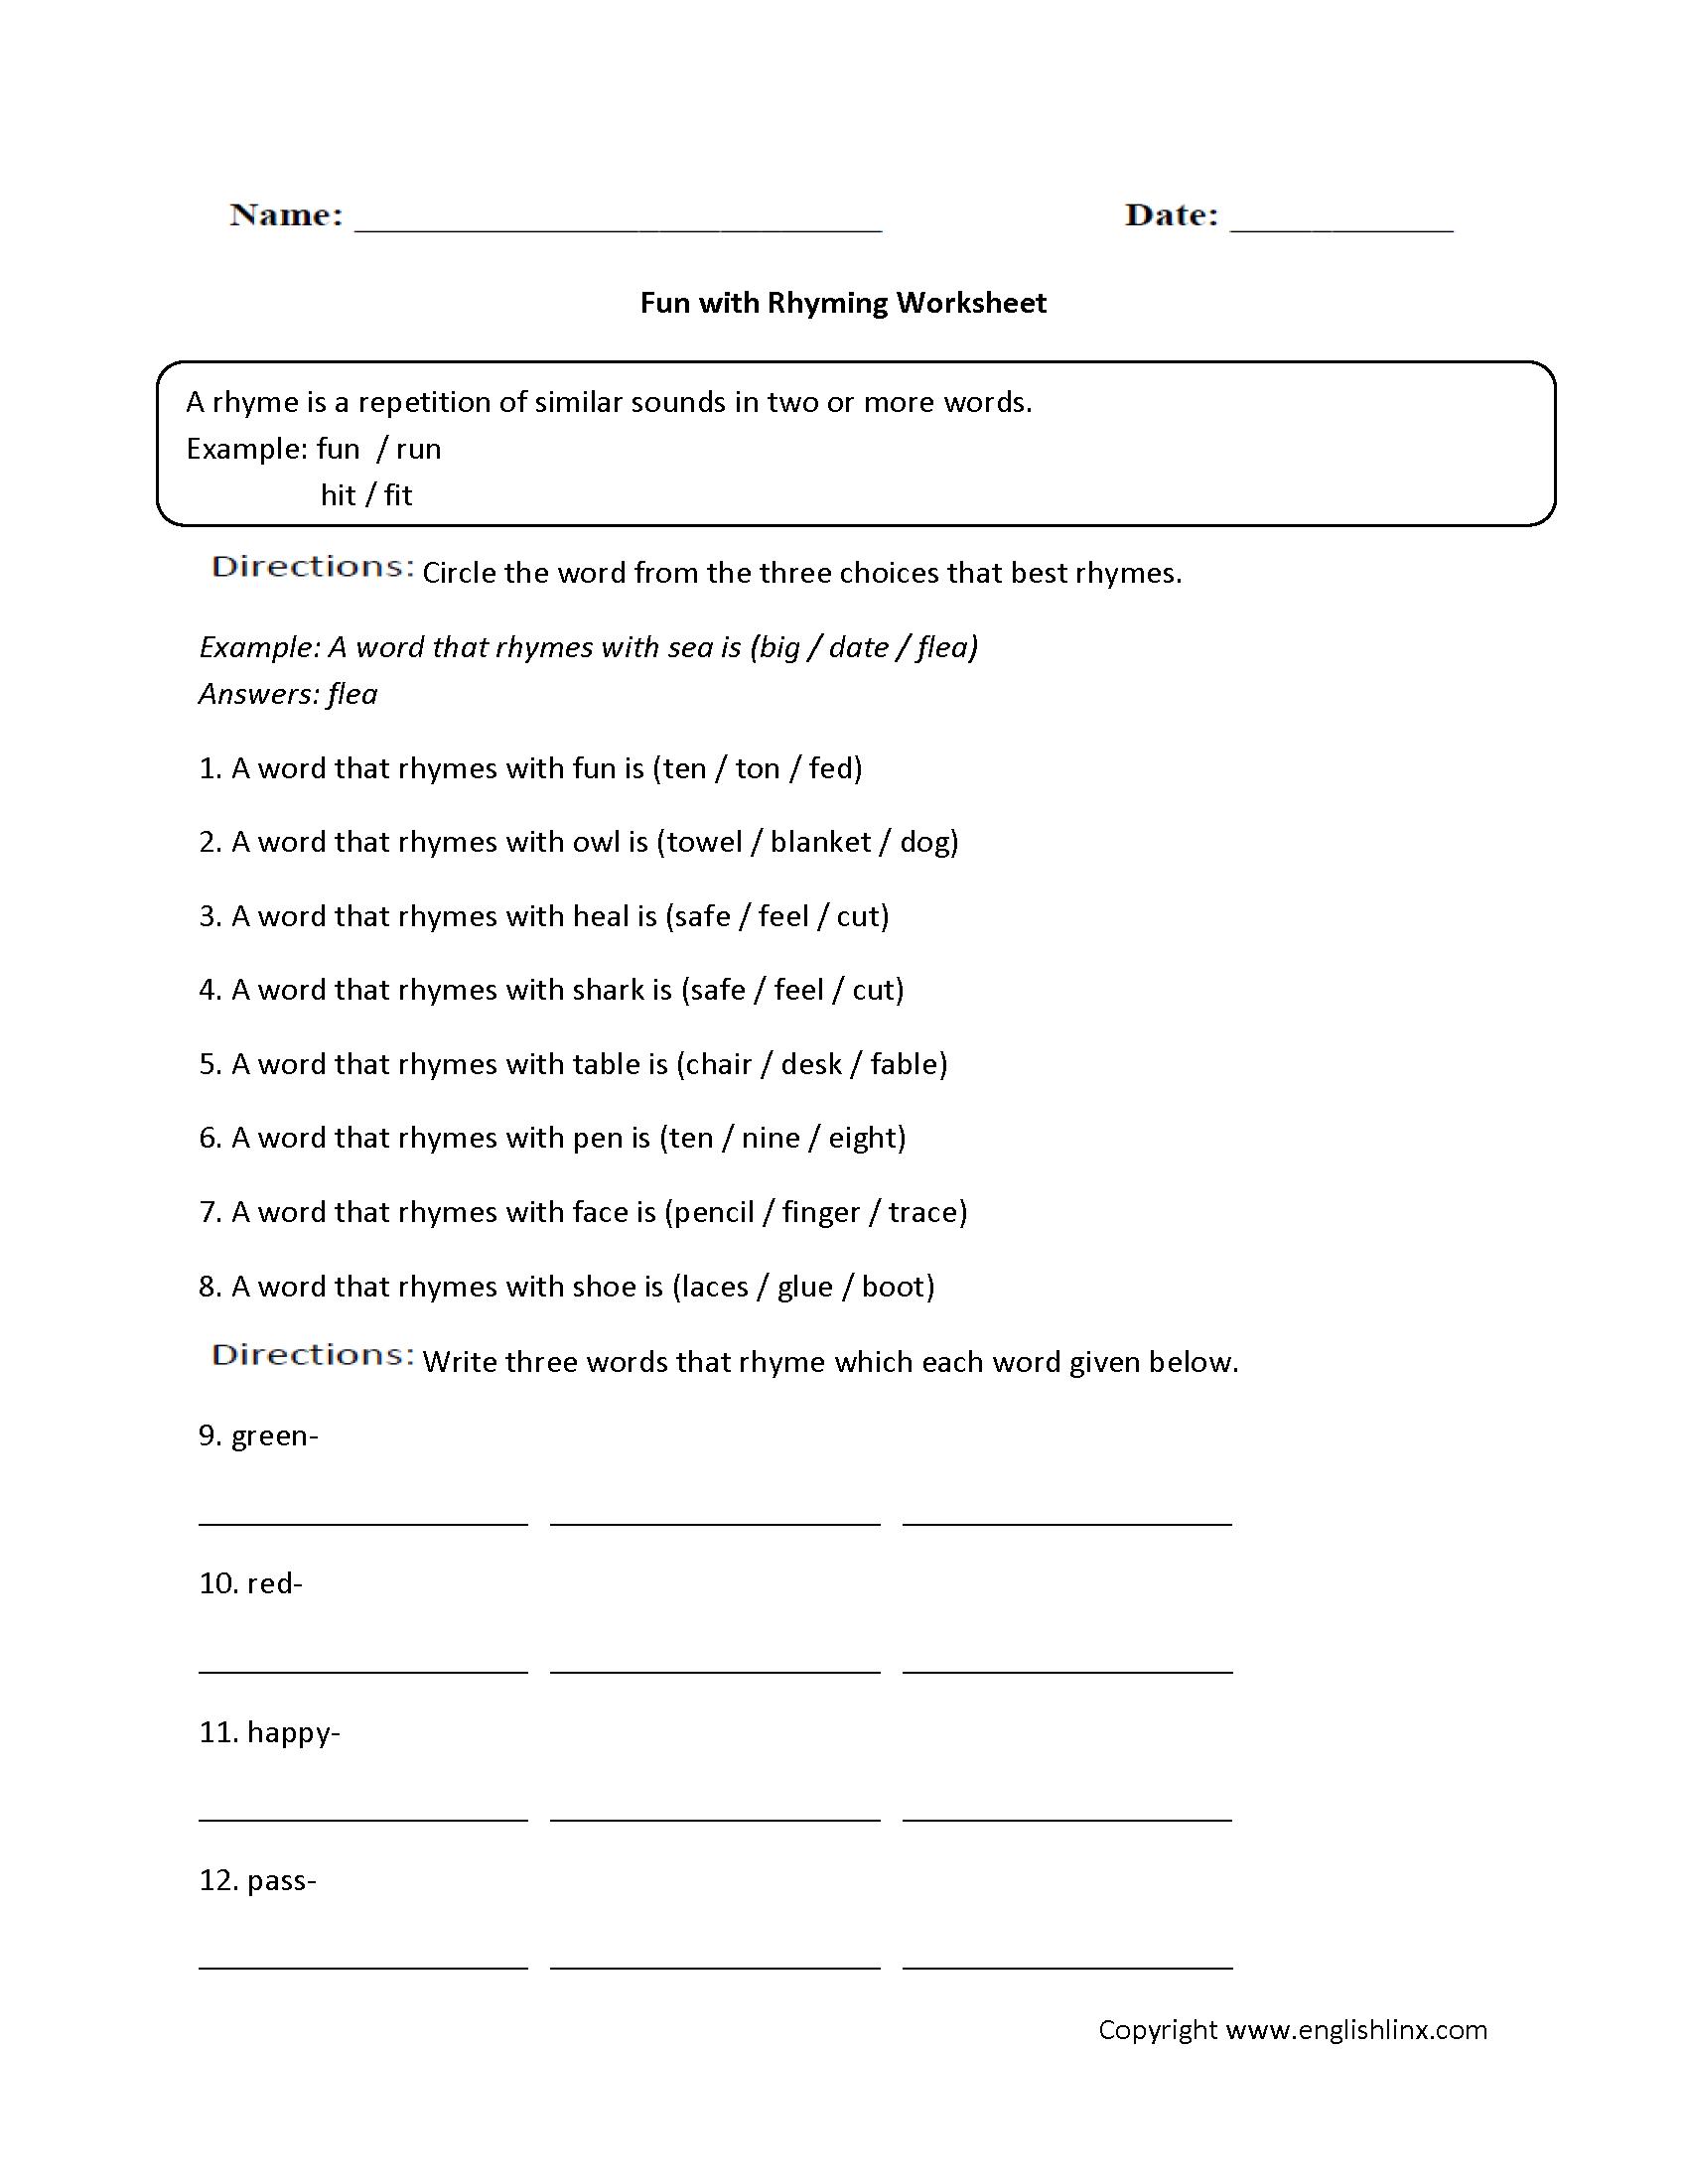 Rhyming Worksheets For Prek   Printable Worksheets and Activities for  Teachers [ 2200 x 1700 Pixel ]